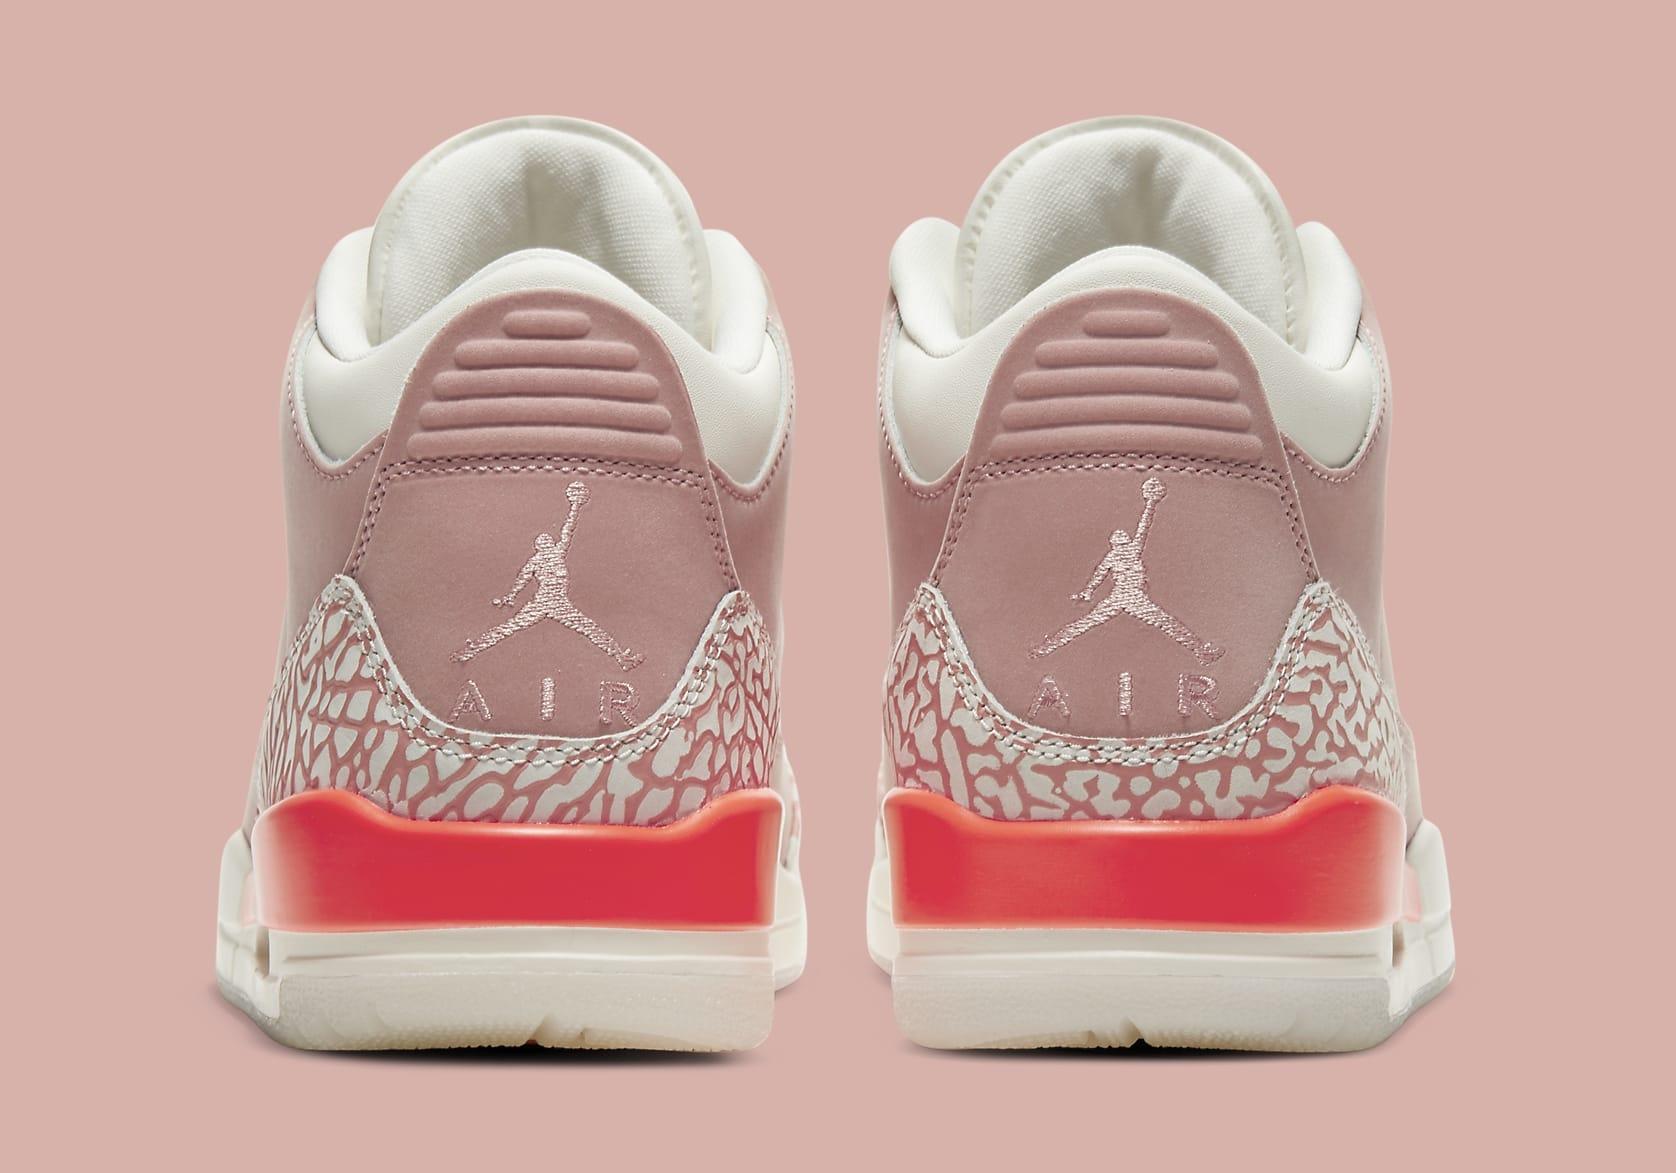 Air Jordan 3 Retro Women's 'Rust Pink' CK9246-600 Heel